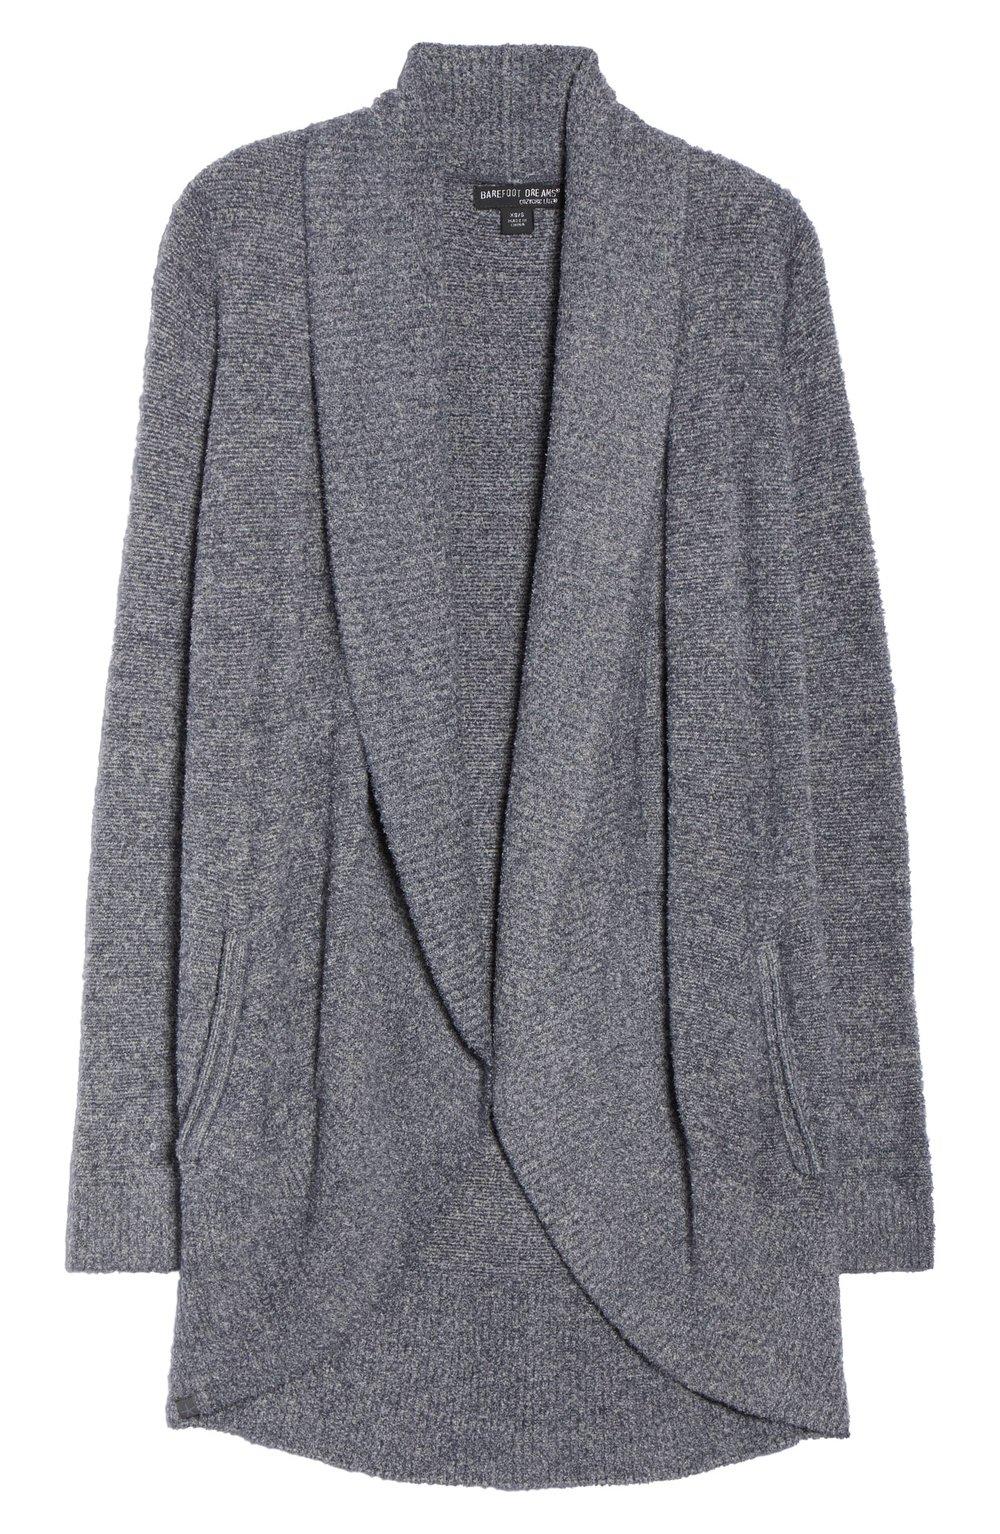 Barefoot Dreams CozyChic Lite® Circle Cardigan